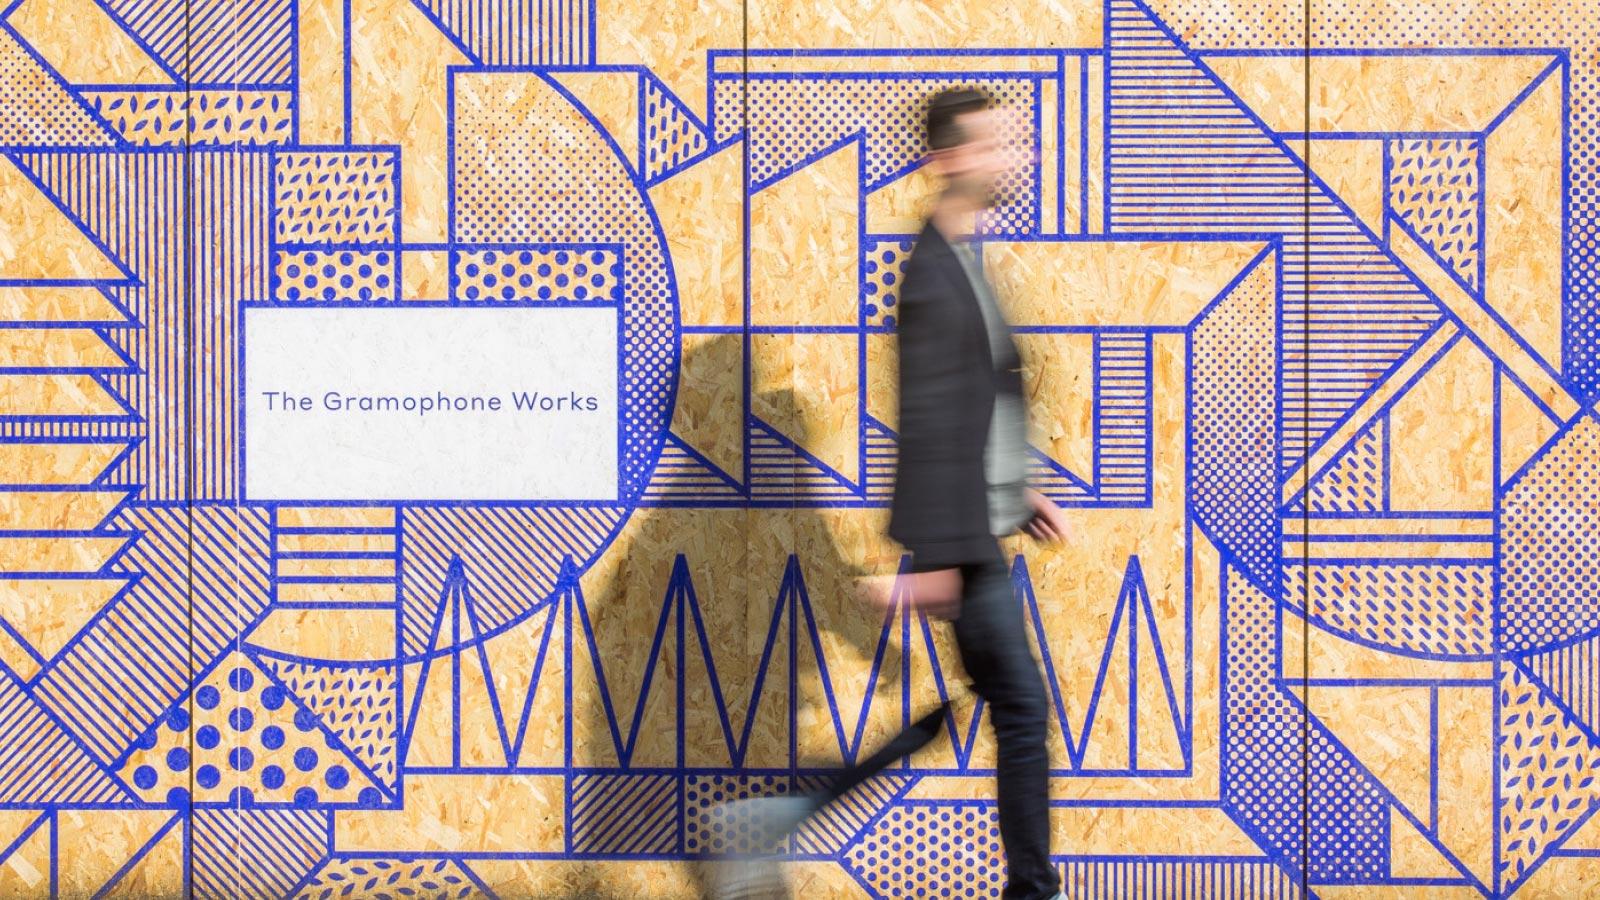 Gramophone-works-03-hoarding